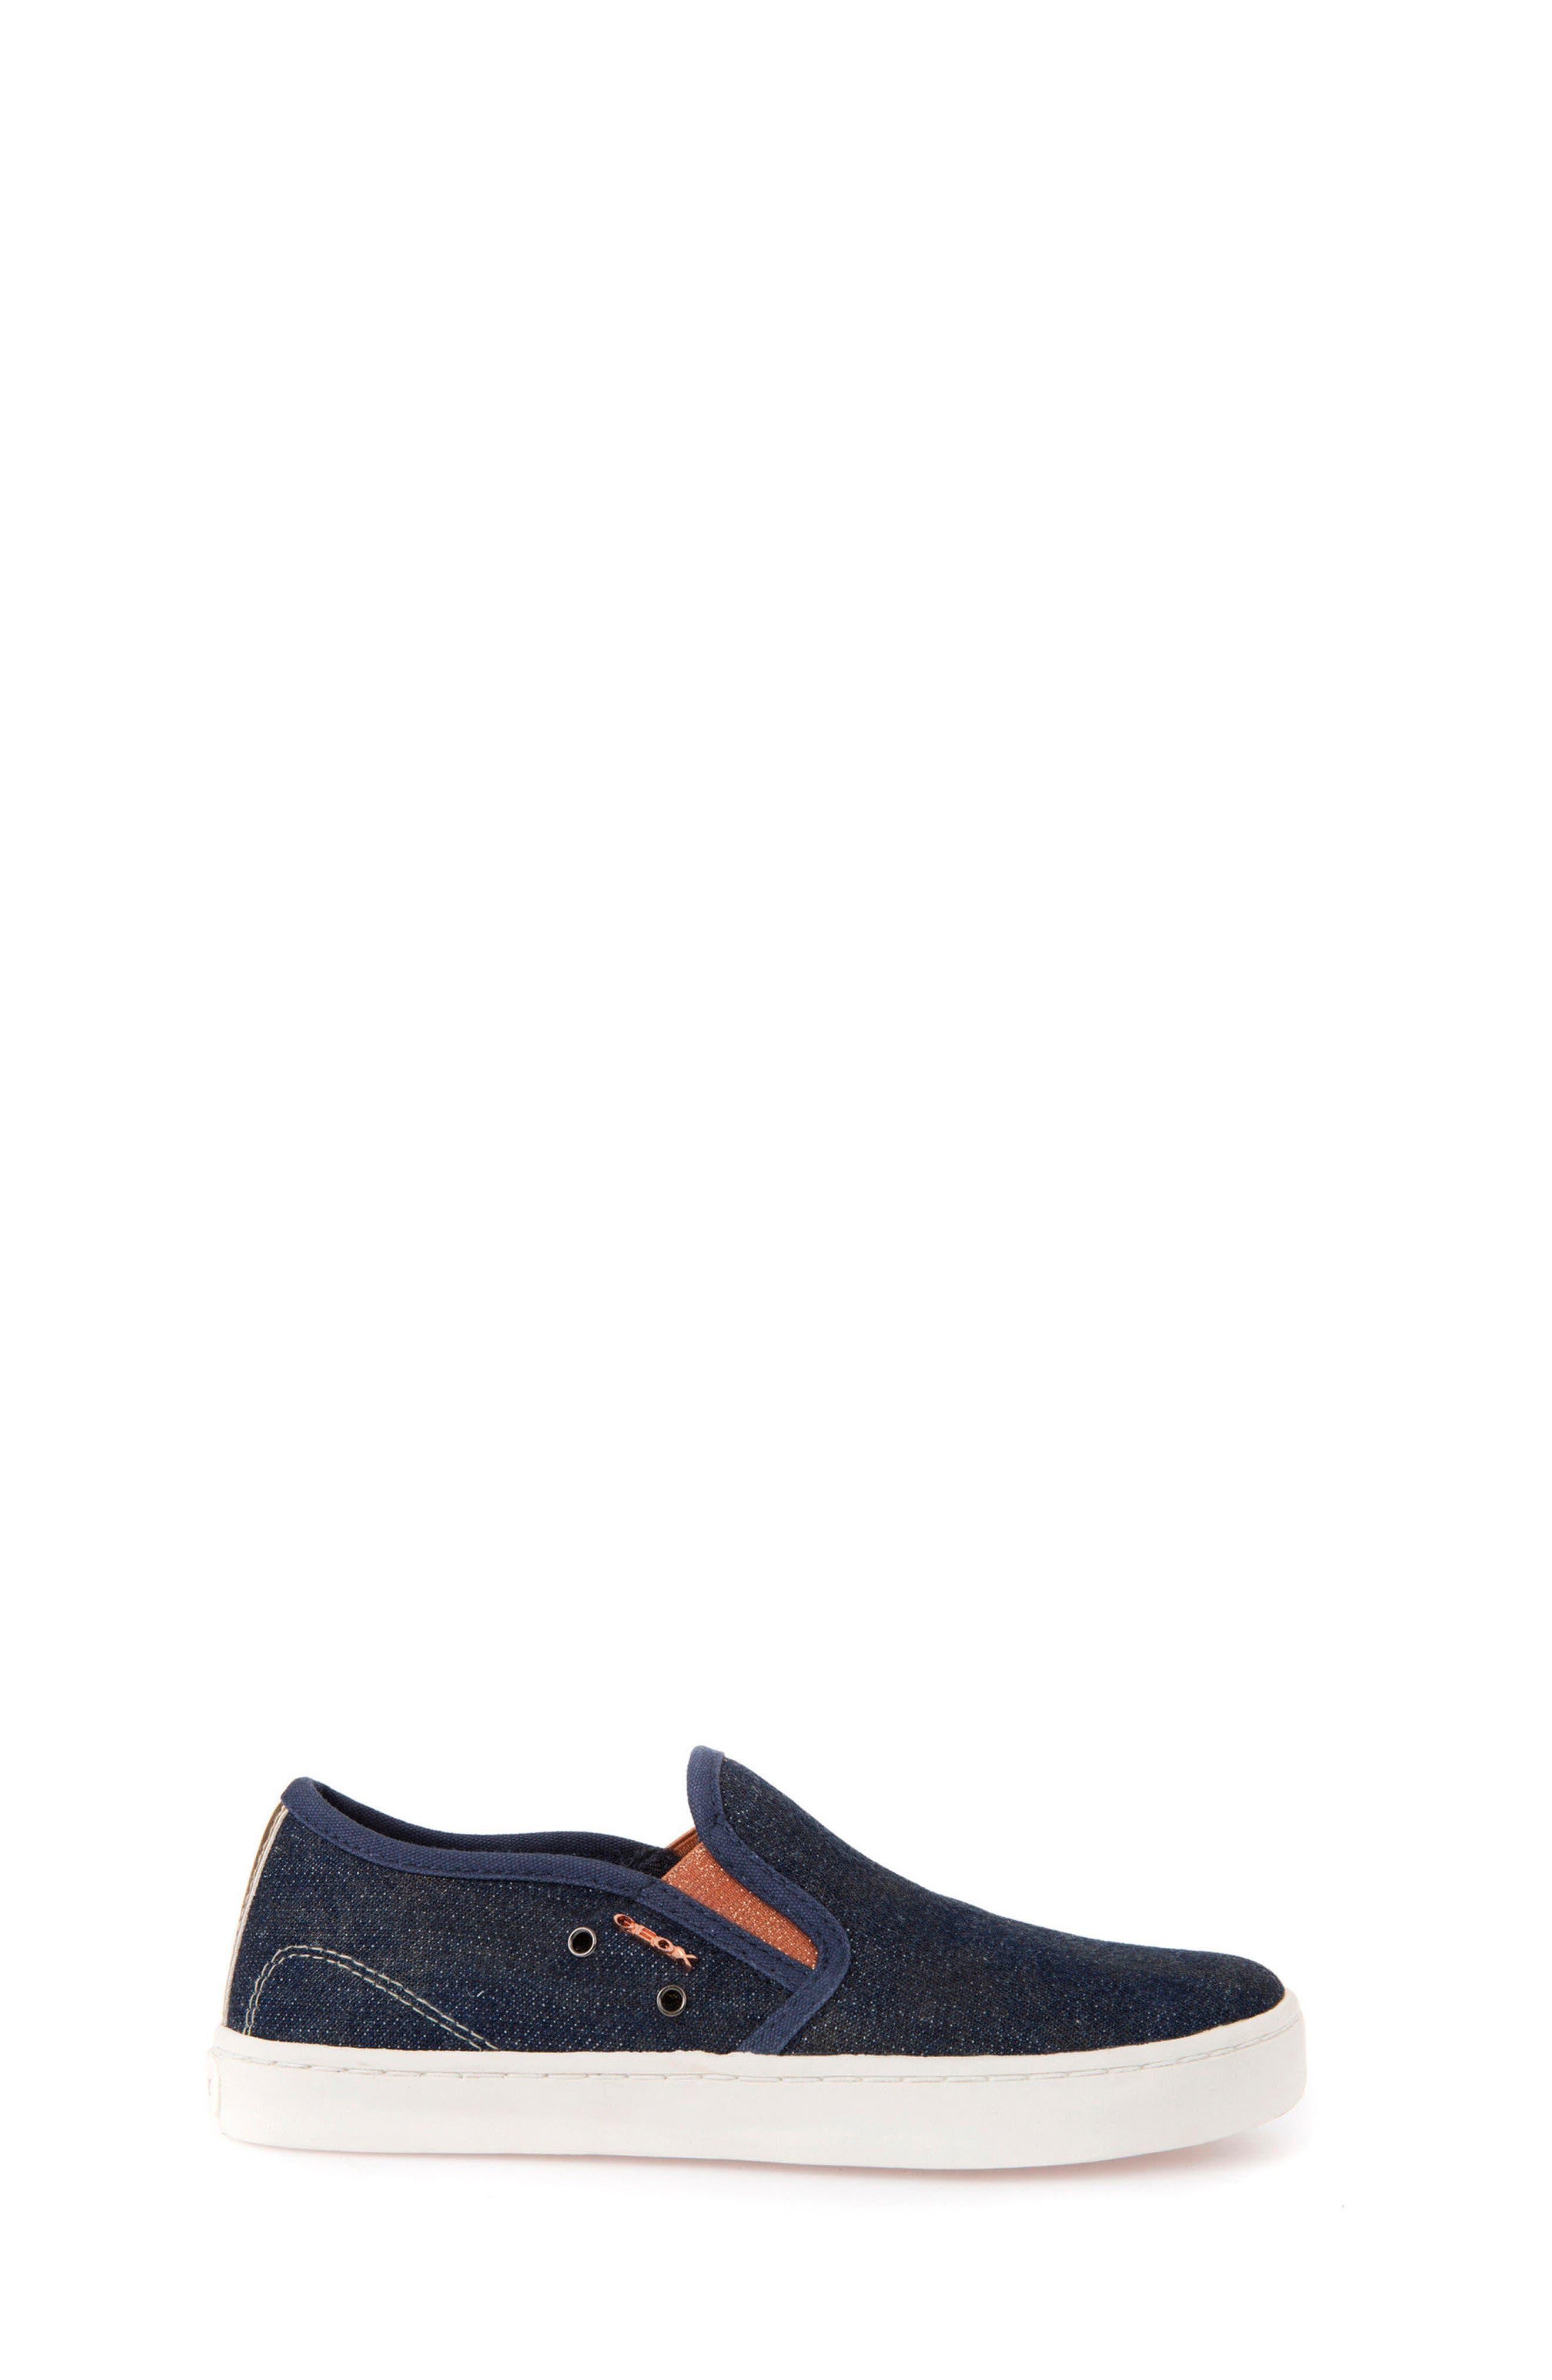 Jr Kiwi Slip-On Waterproof Sneaker,                             Alternate thumbnail 3, color,                             JEANS